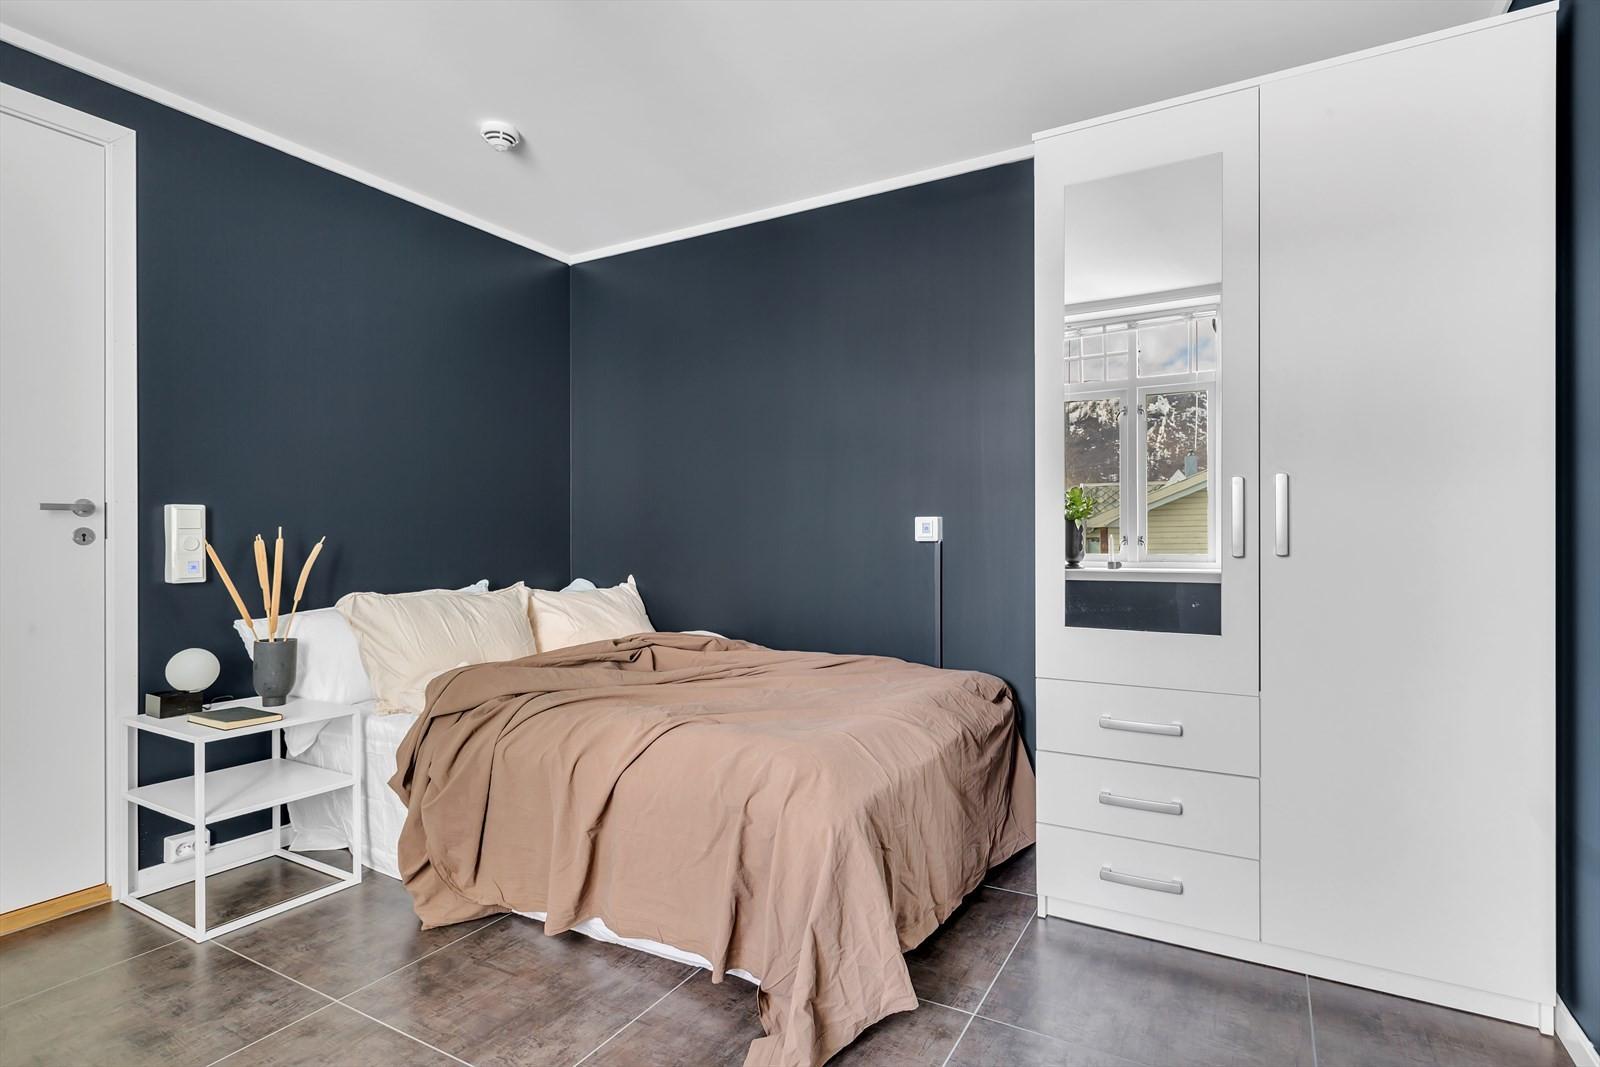 Tanken med dette rommet er enten et master soverom med egen bad eller en hybel